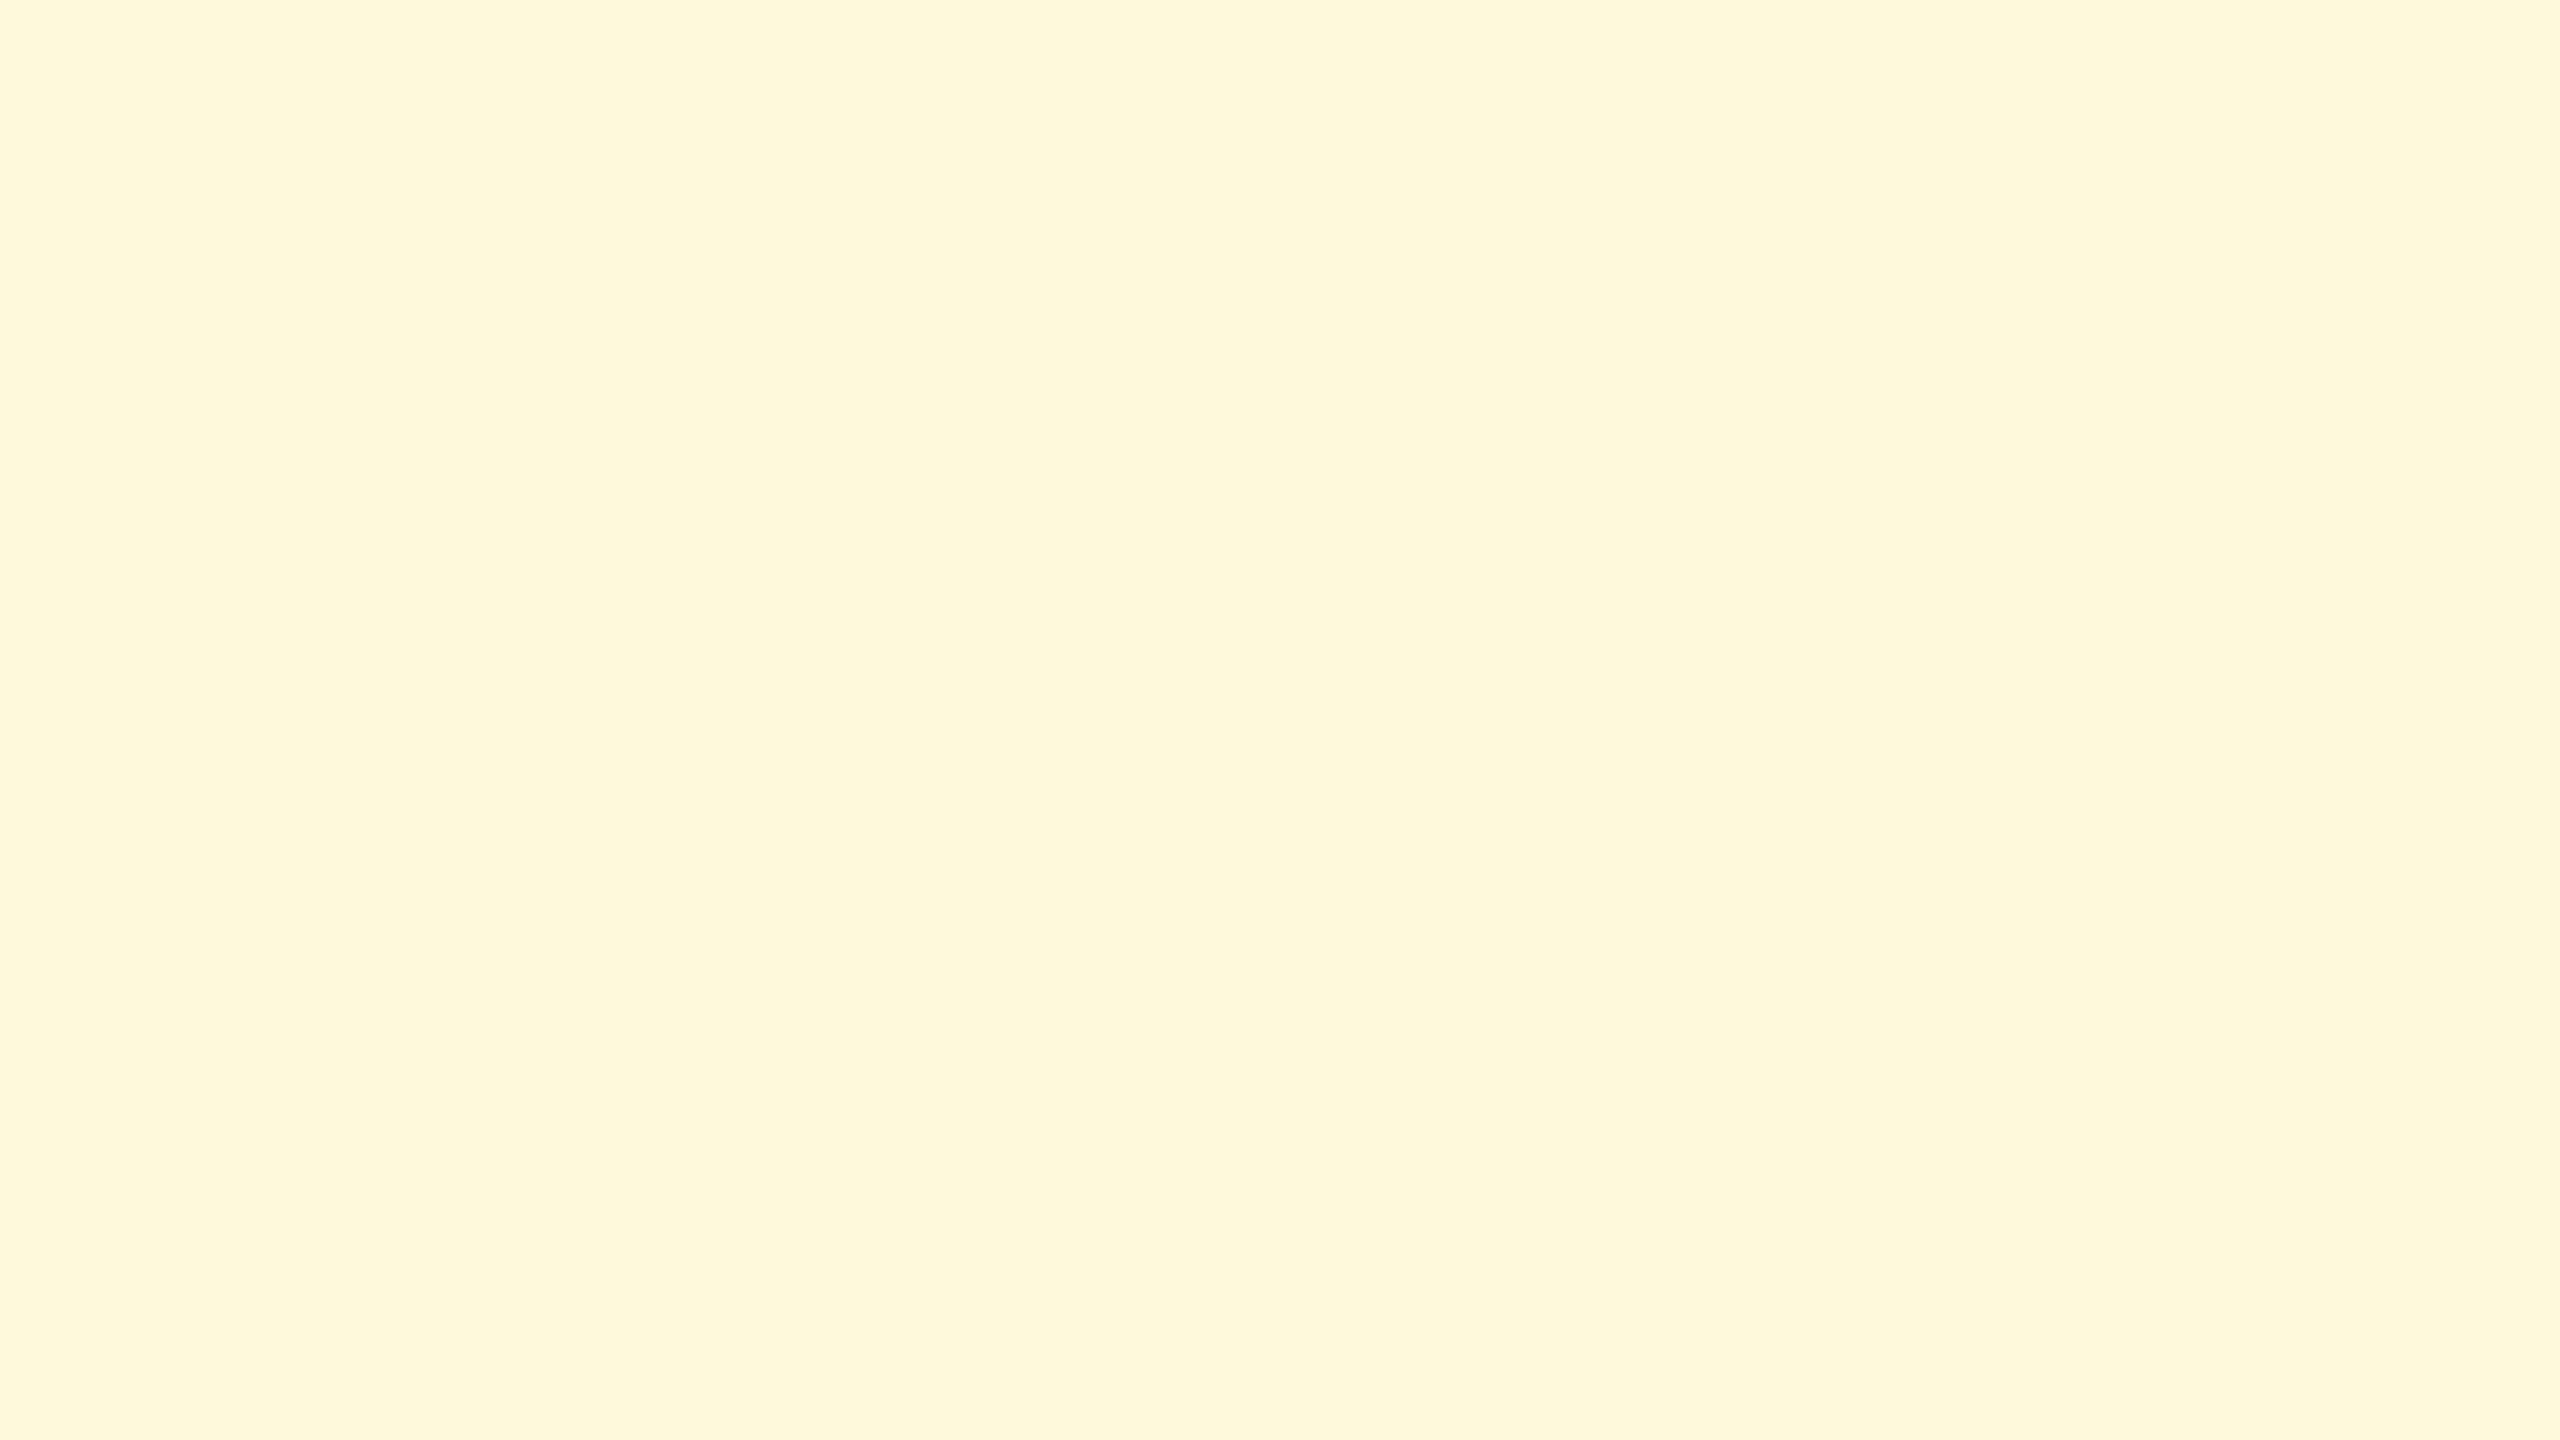 2560x1440 Cornsilk Solid Color Background